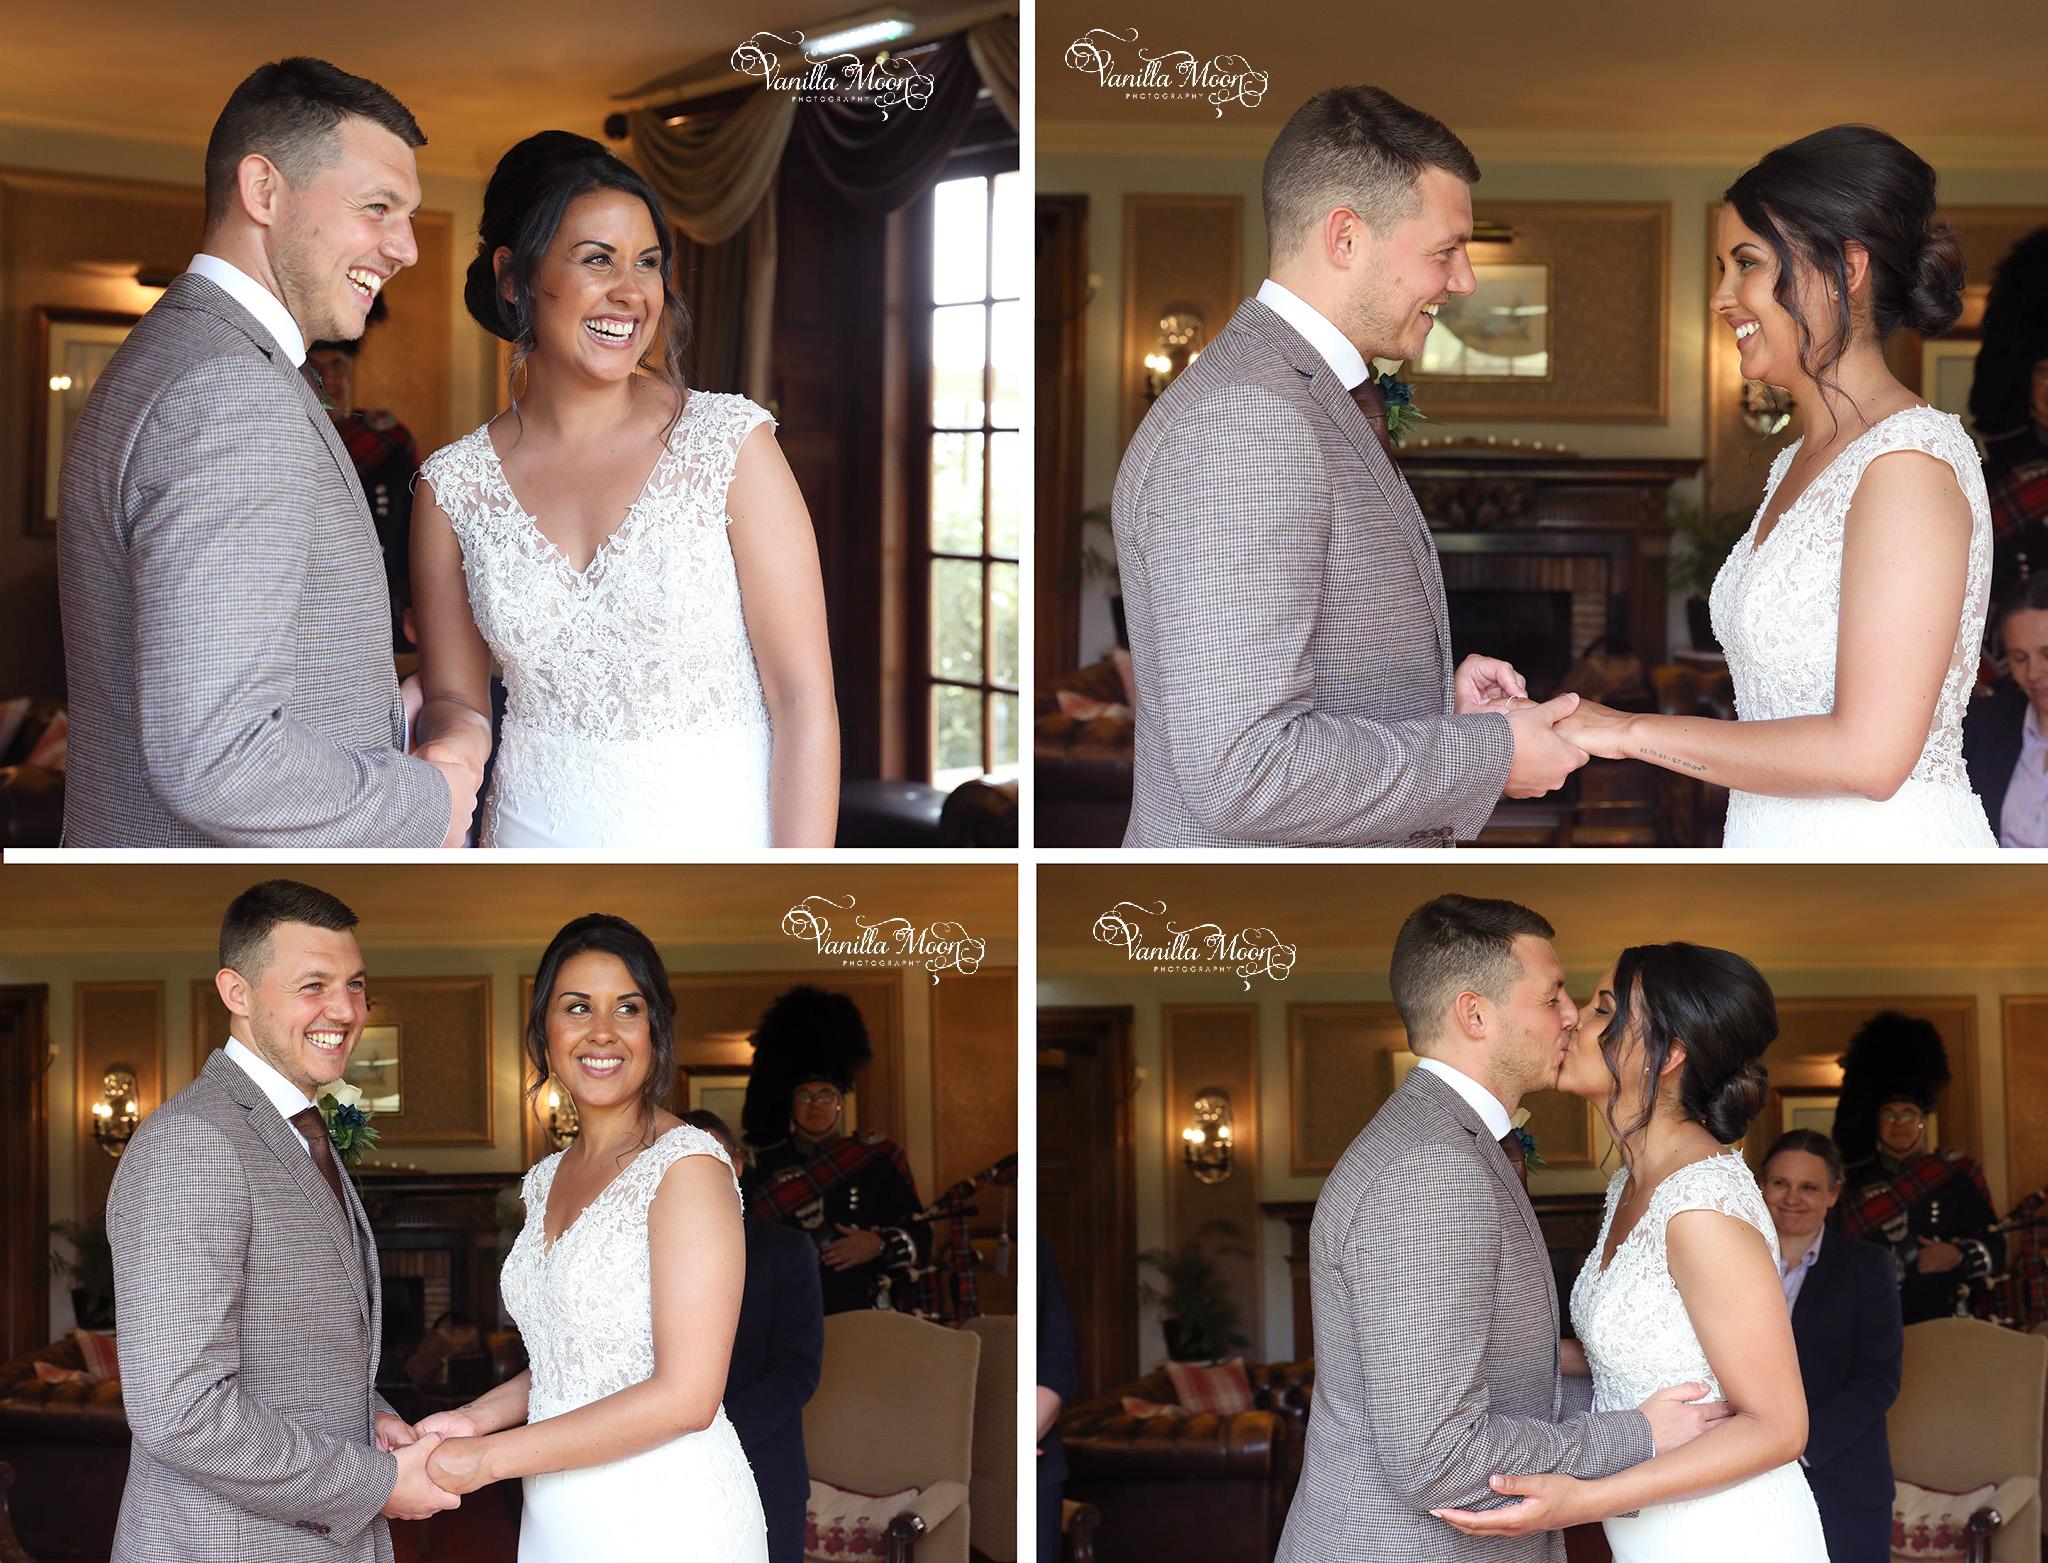 Outdoor Intimate Wedding Photography Scottish Borders